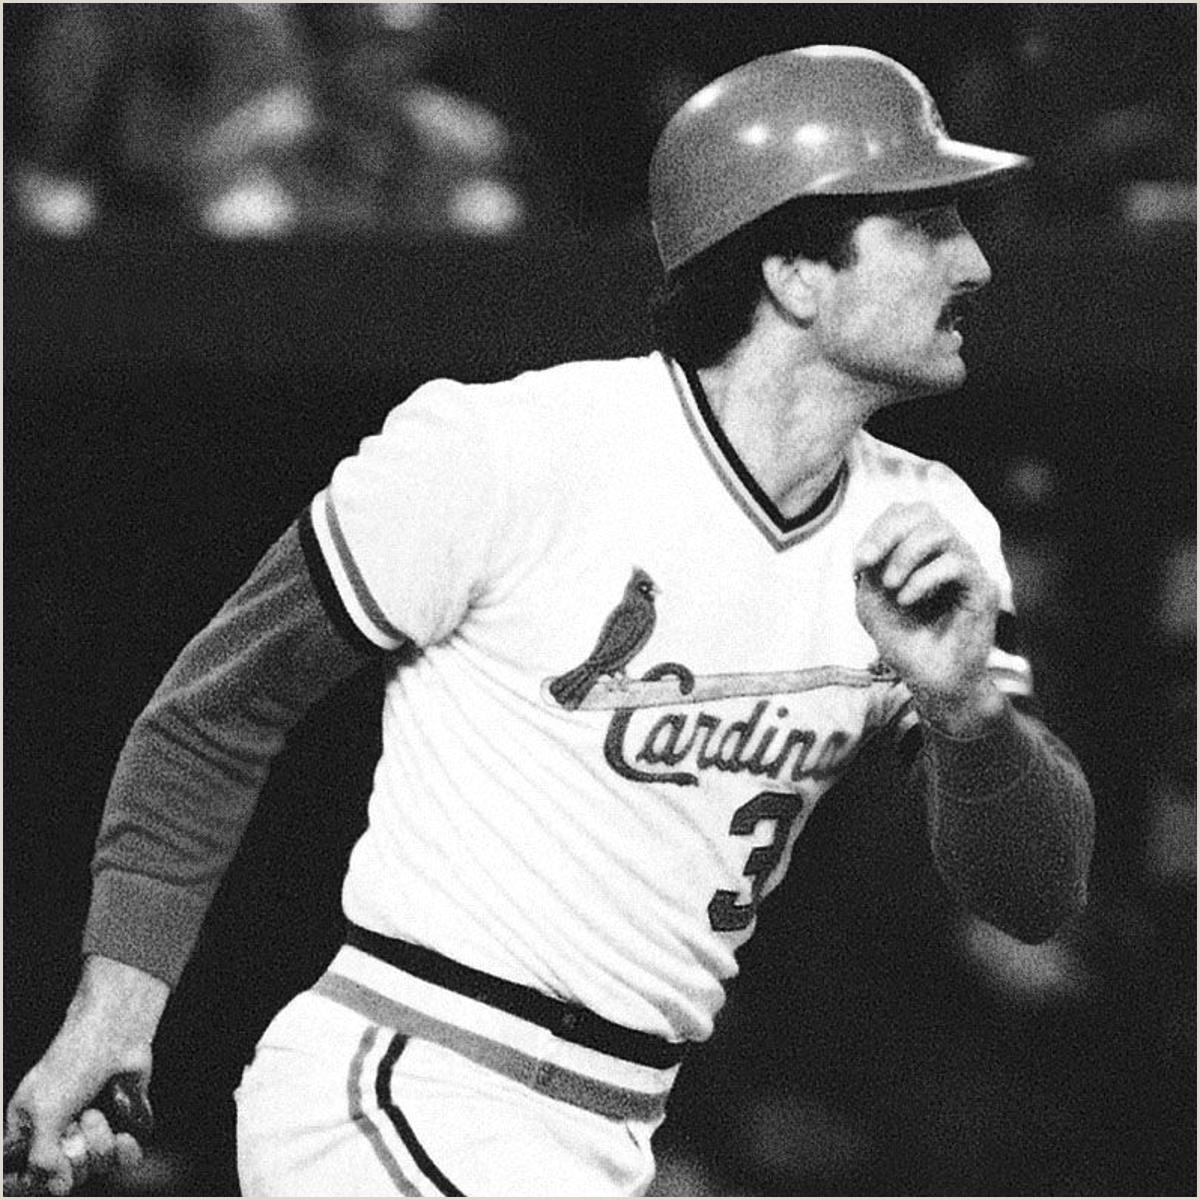 Unique Sport Business Cards Baseball Hochman Whitey Herzog Agrees – Keith Hernandez Deserves